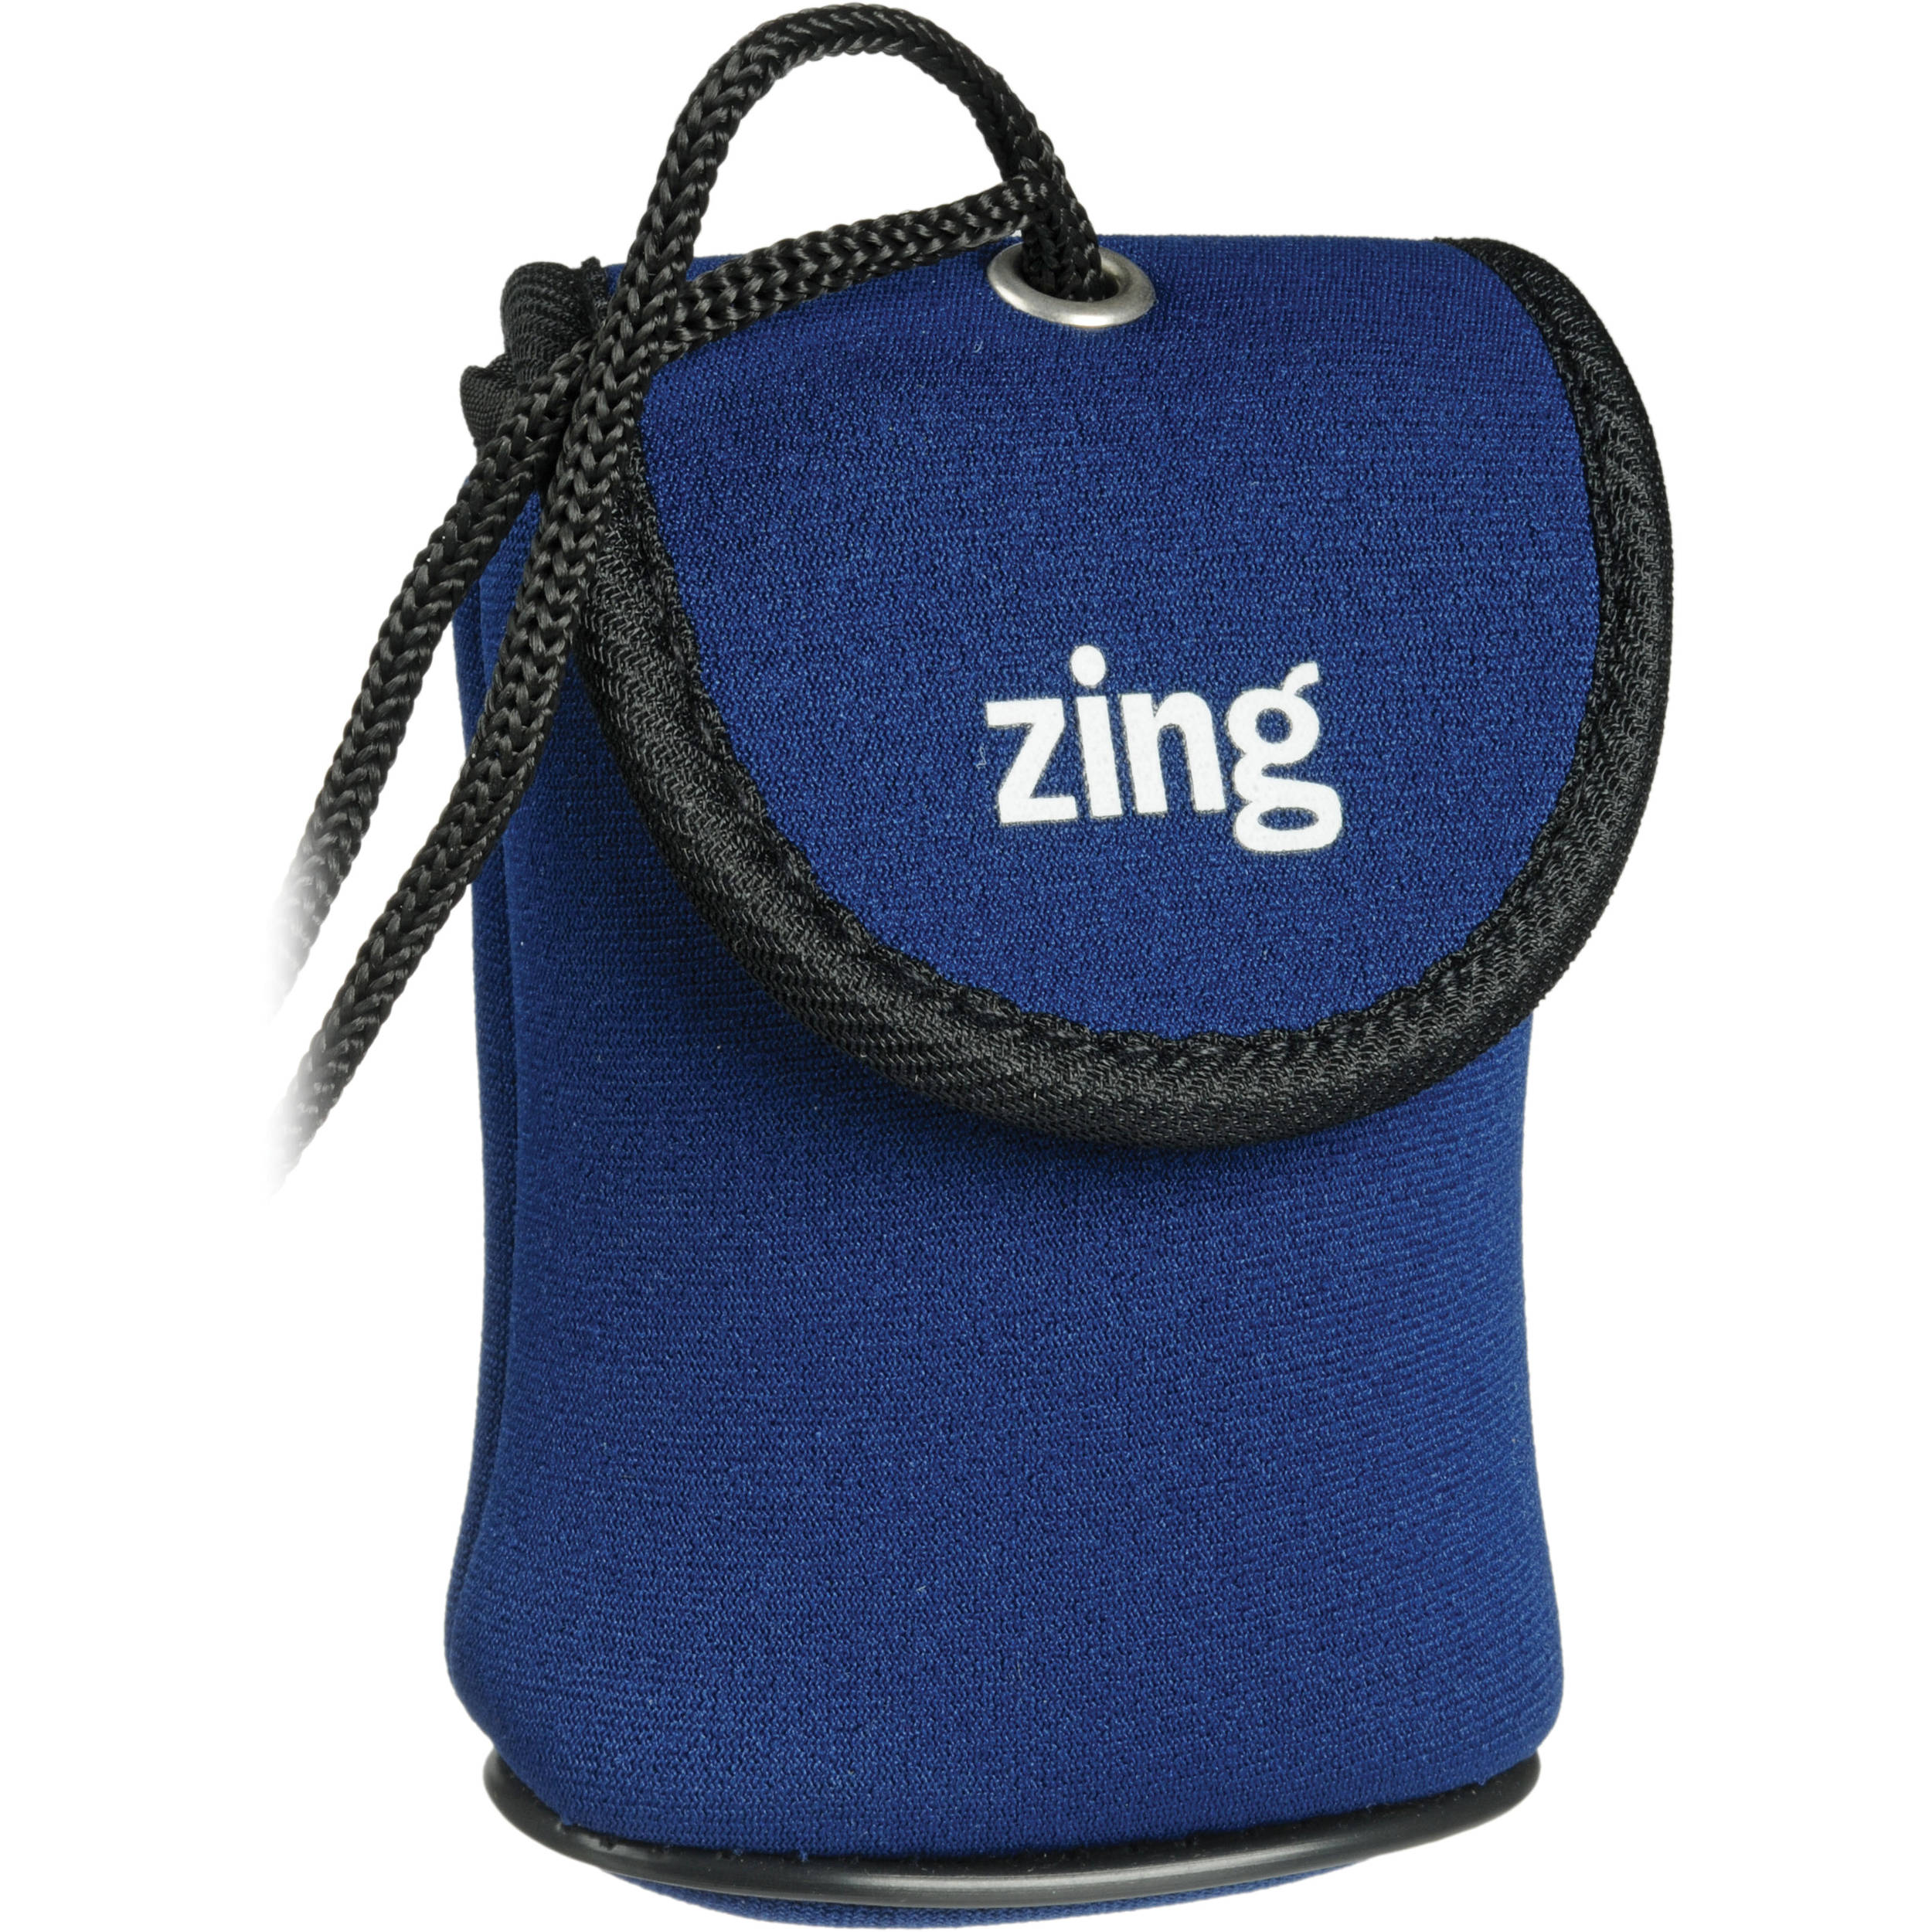 zing - photo #27